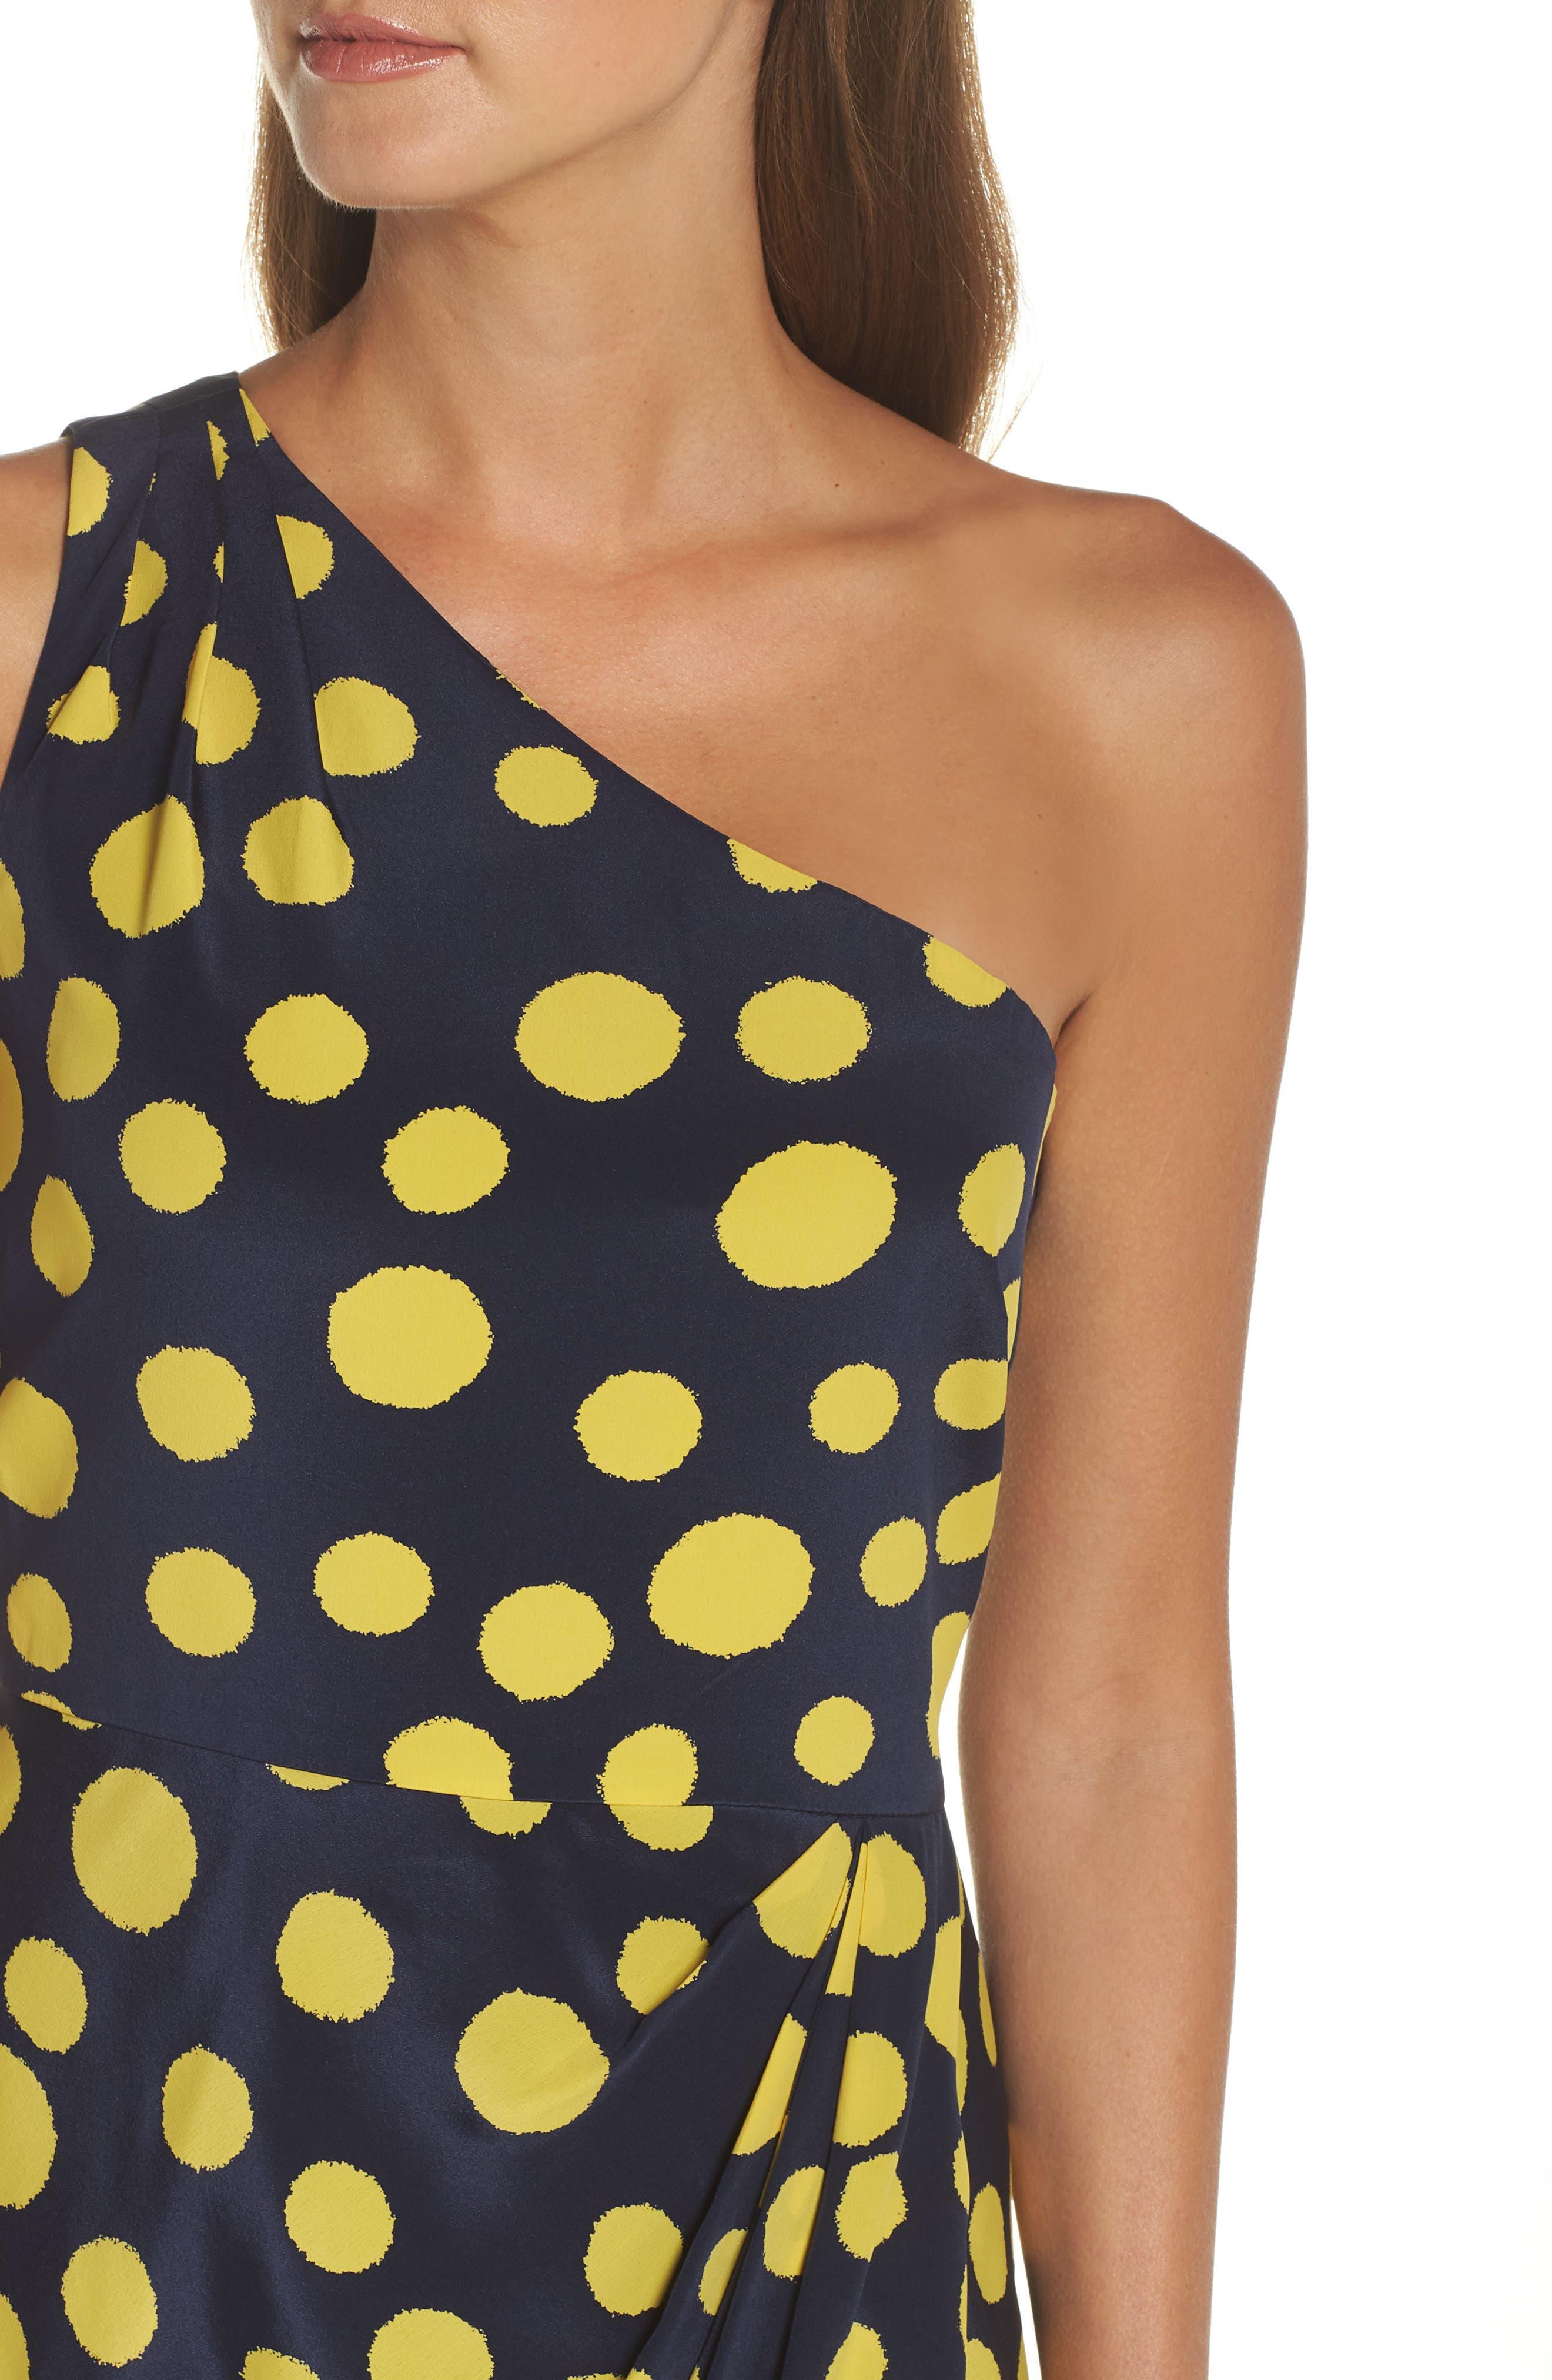 J.CREW,                             Polka Dot One-Shoulder Silk Dress,                             Alternate thumbnail 4, color,                             401